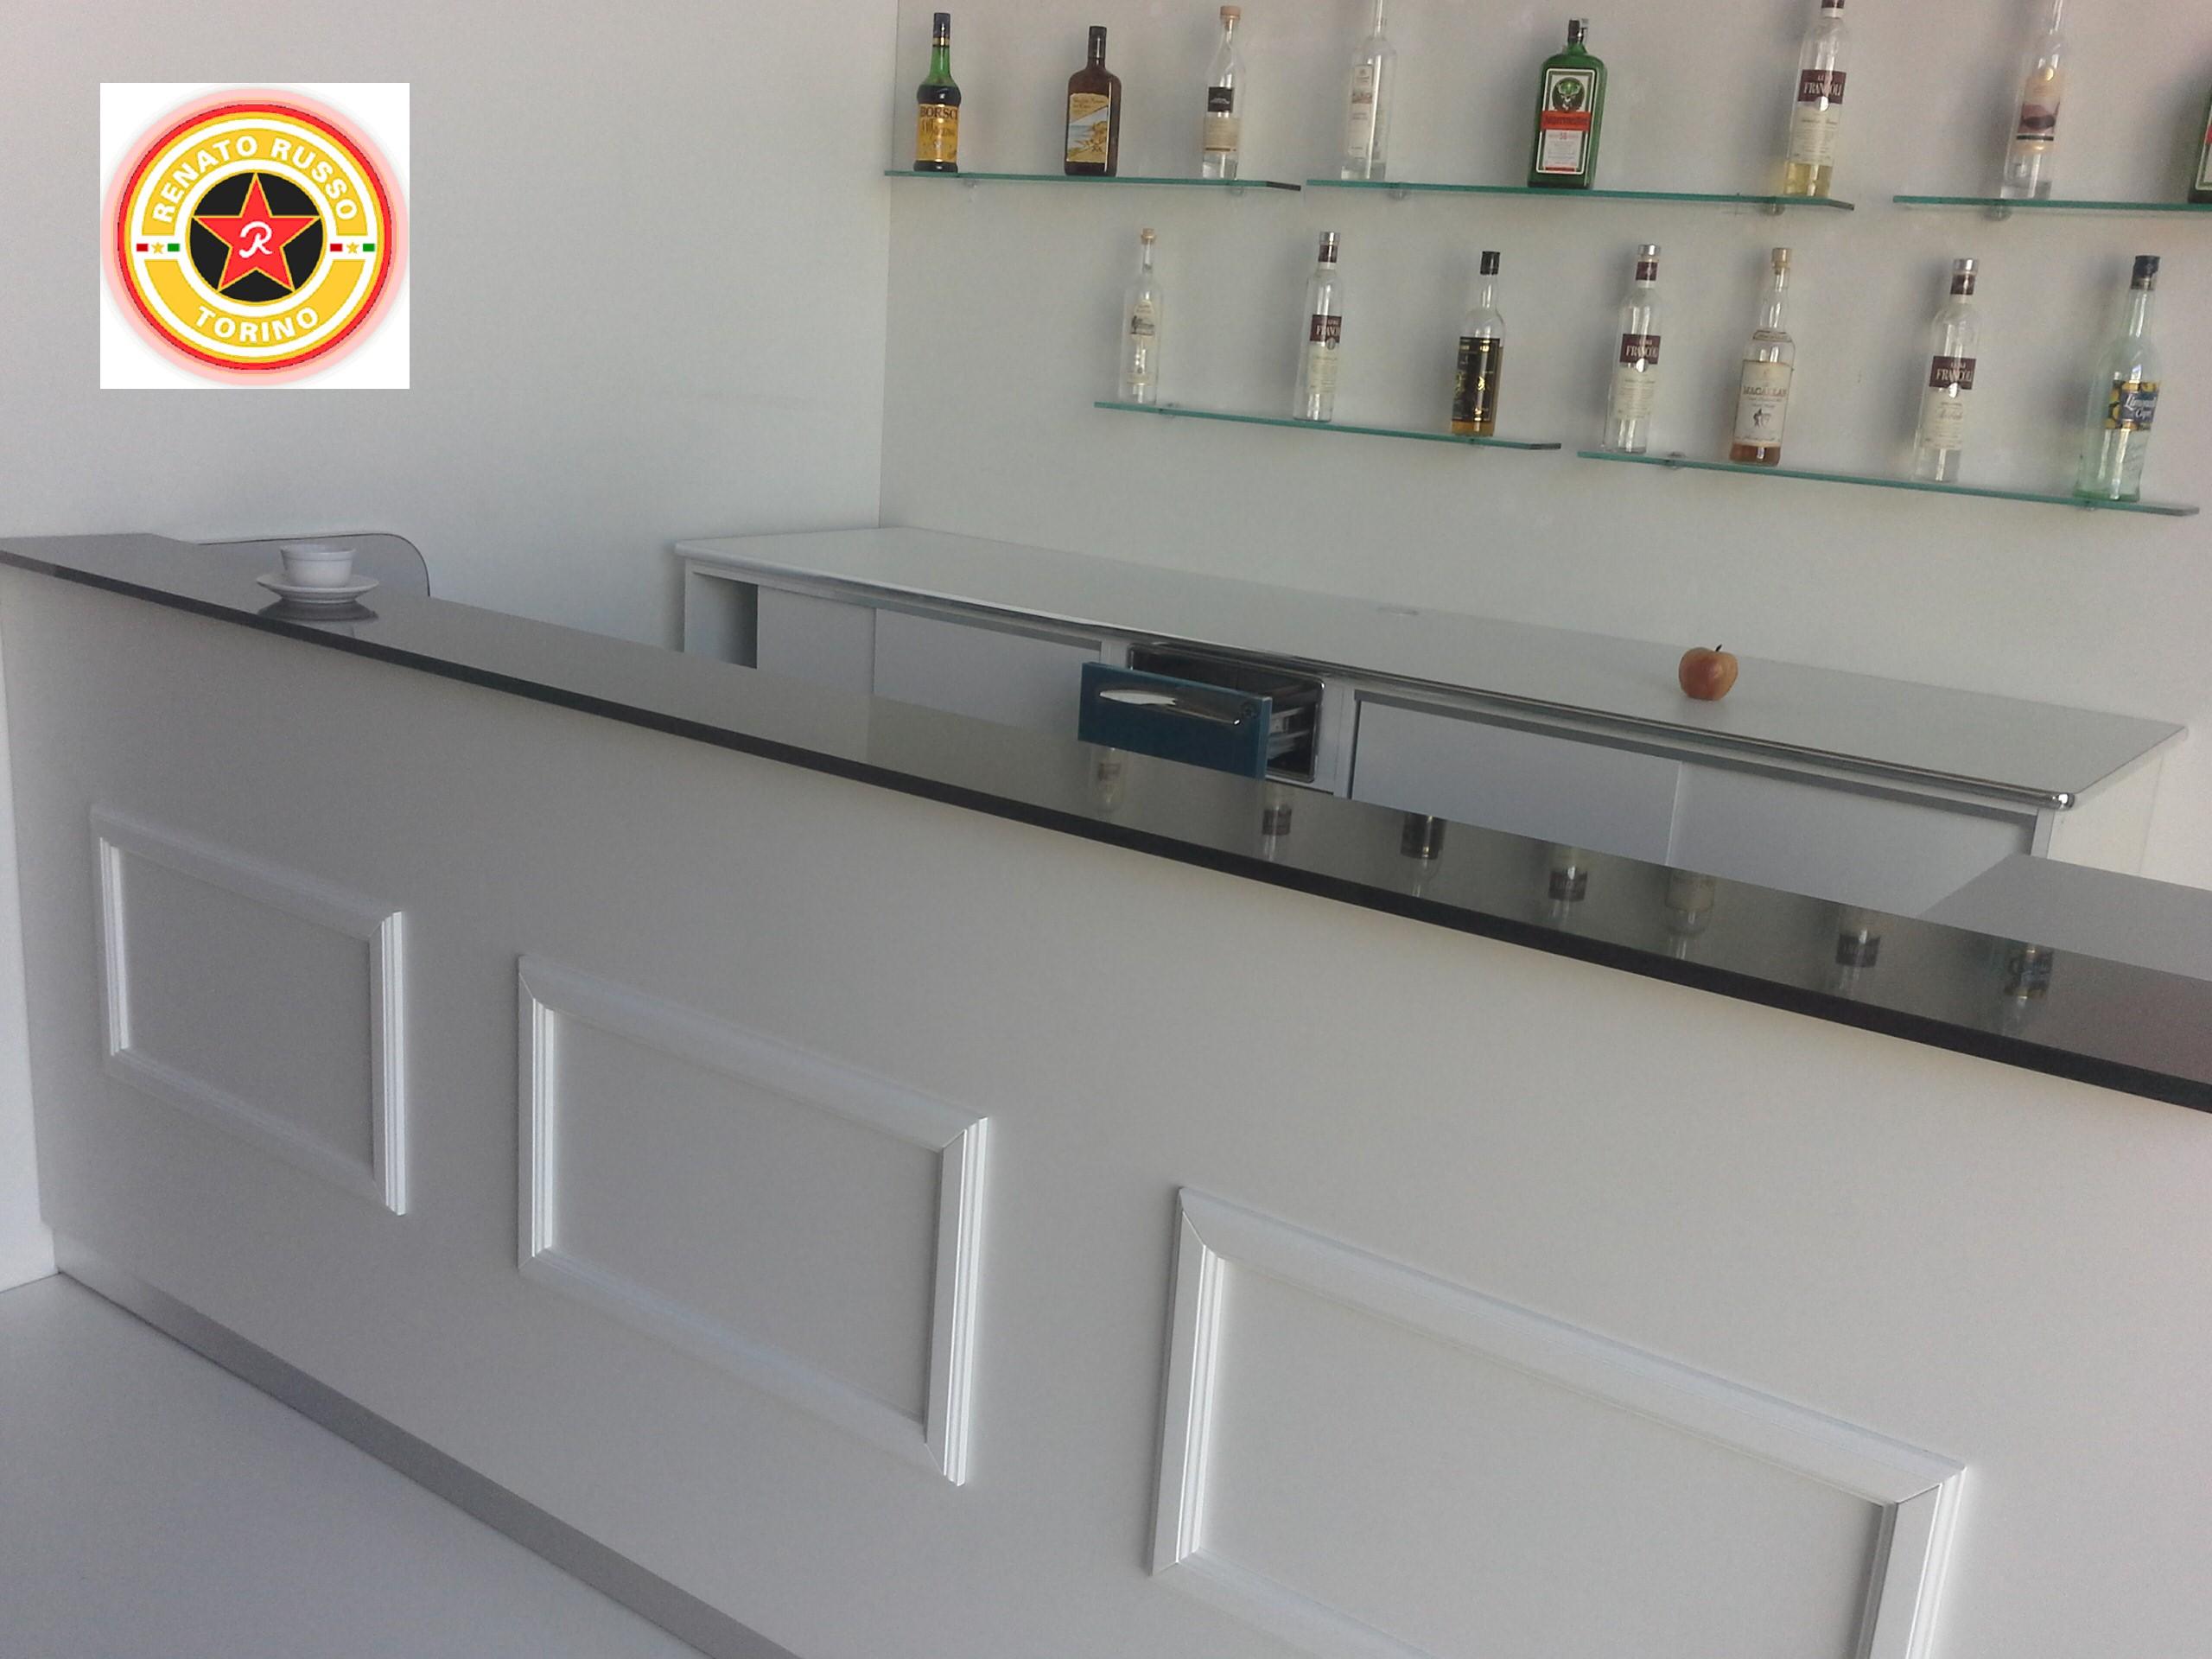 Arredamento Bar Friuli Venezia Giulia.Arredamenti Per Bar Vetrine Refrigerate Banchi Bar Da Rivestire